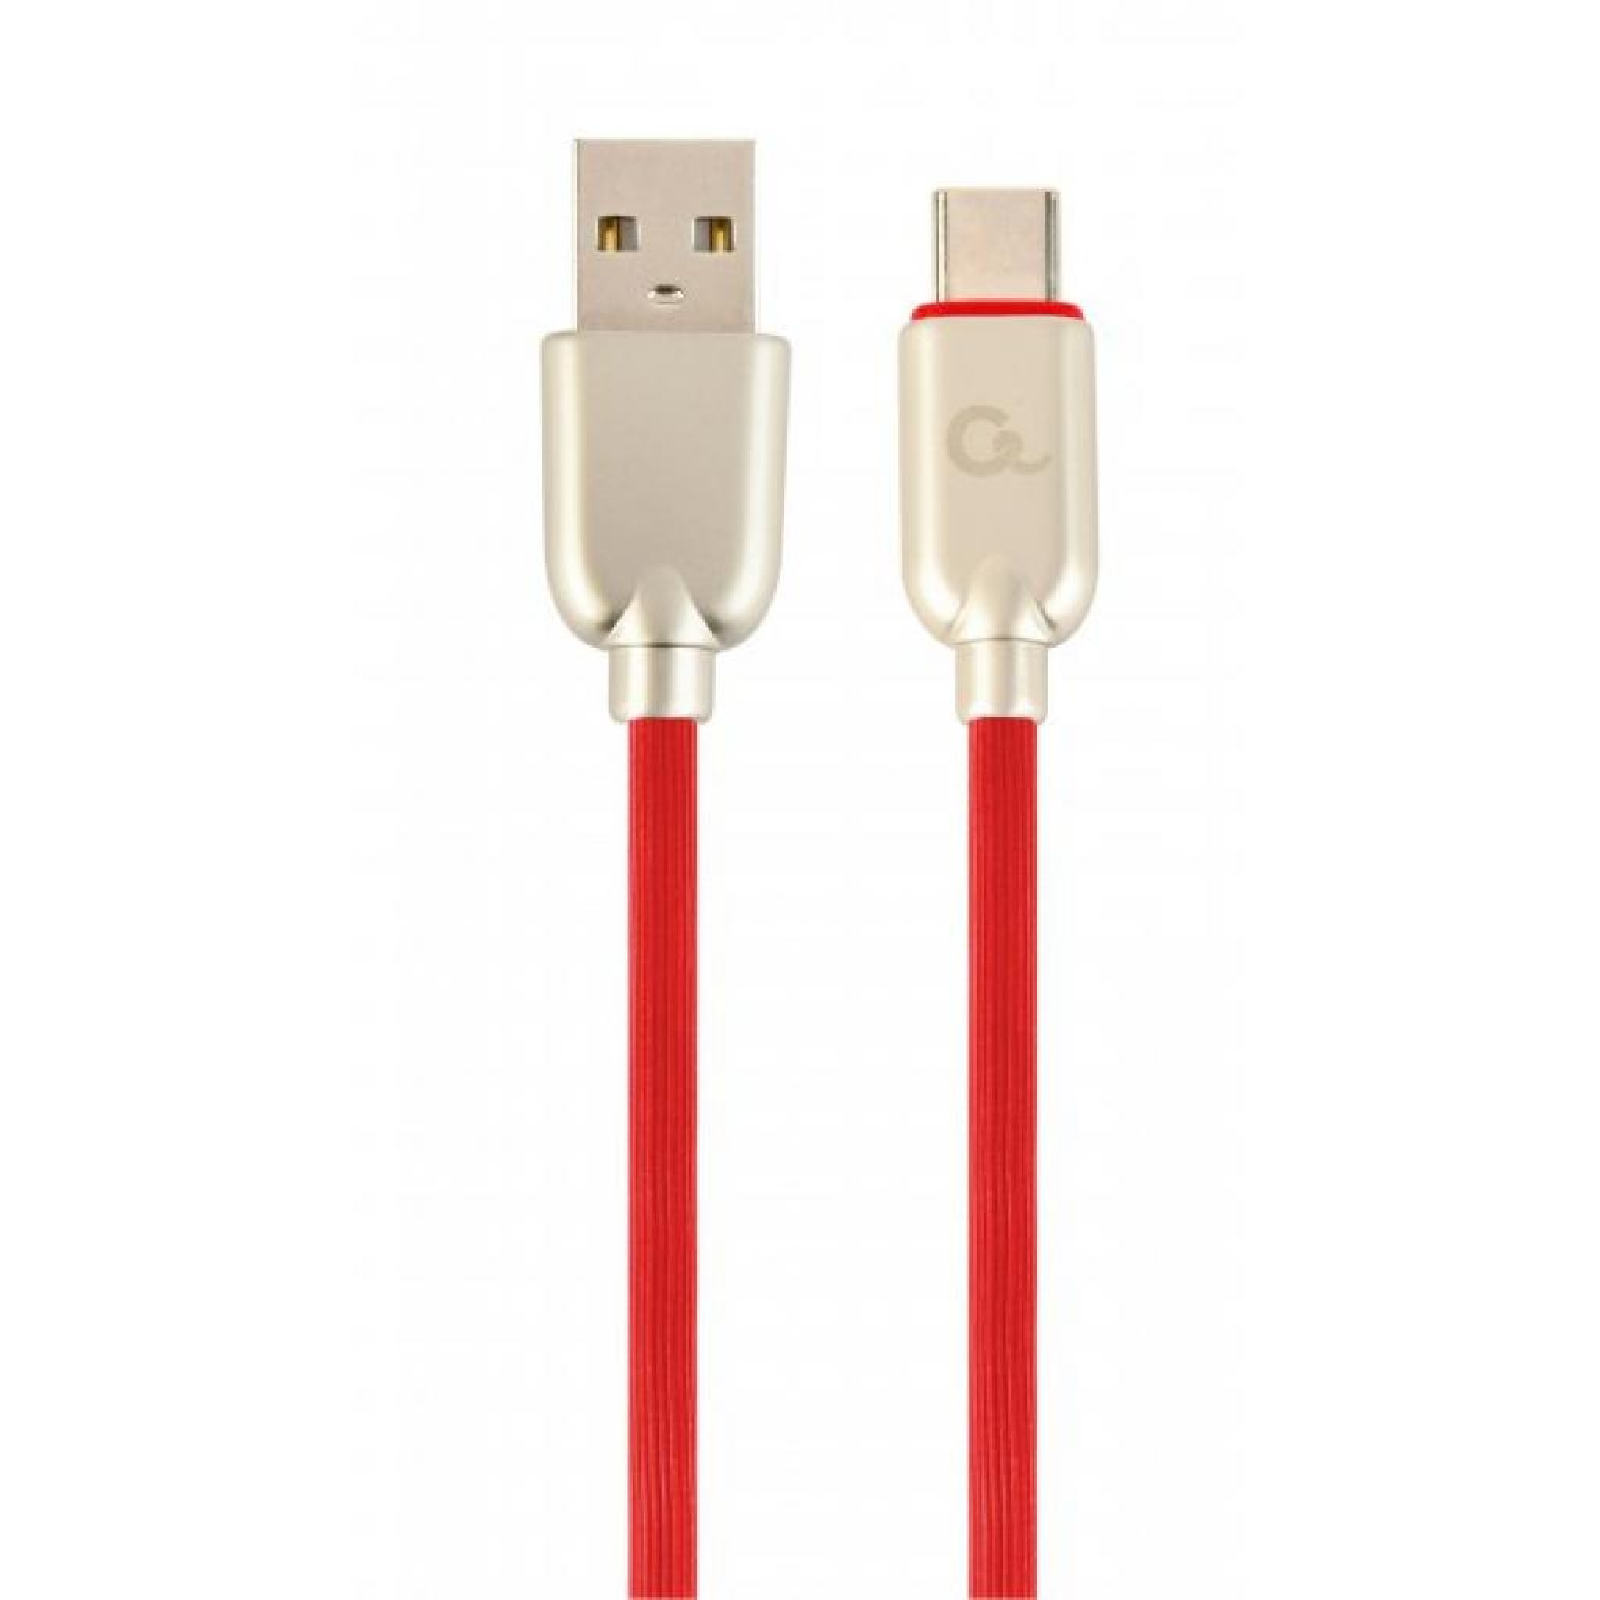 Дата кабель USB 2.0 AM to Type-C 1.0m Cablexpert (CC-USB2R-AMCM-1M-R)